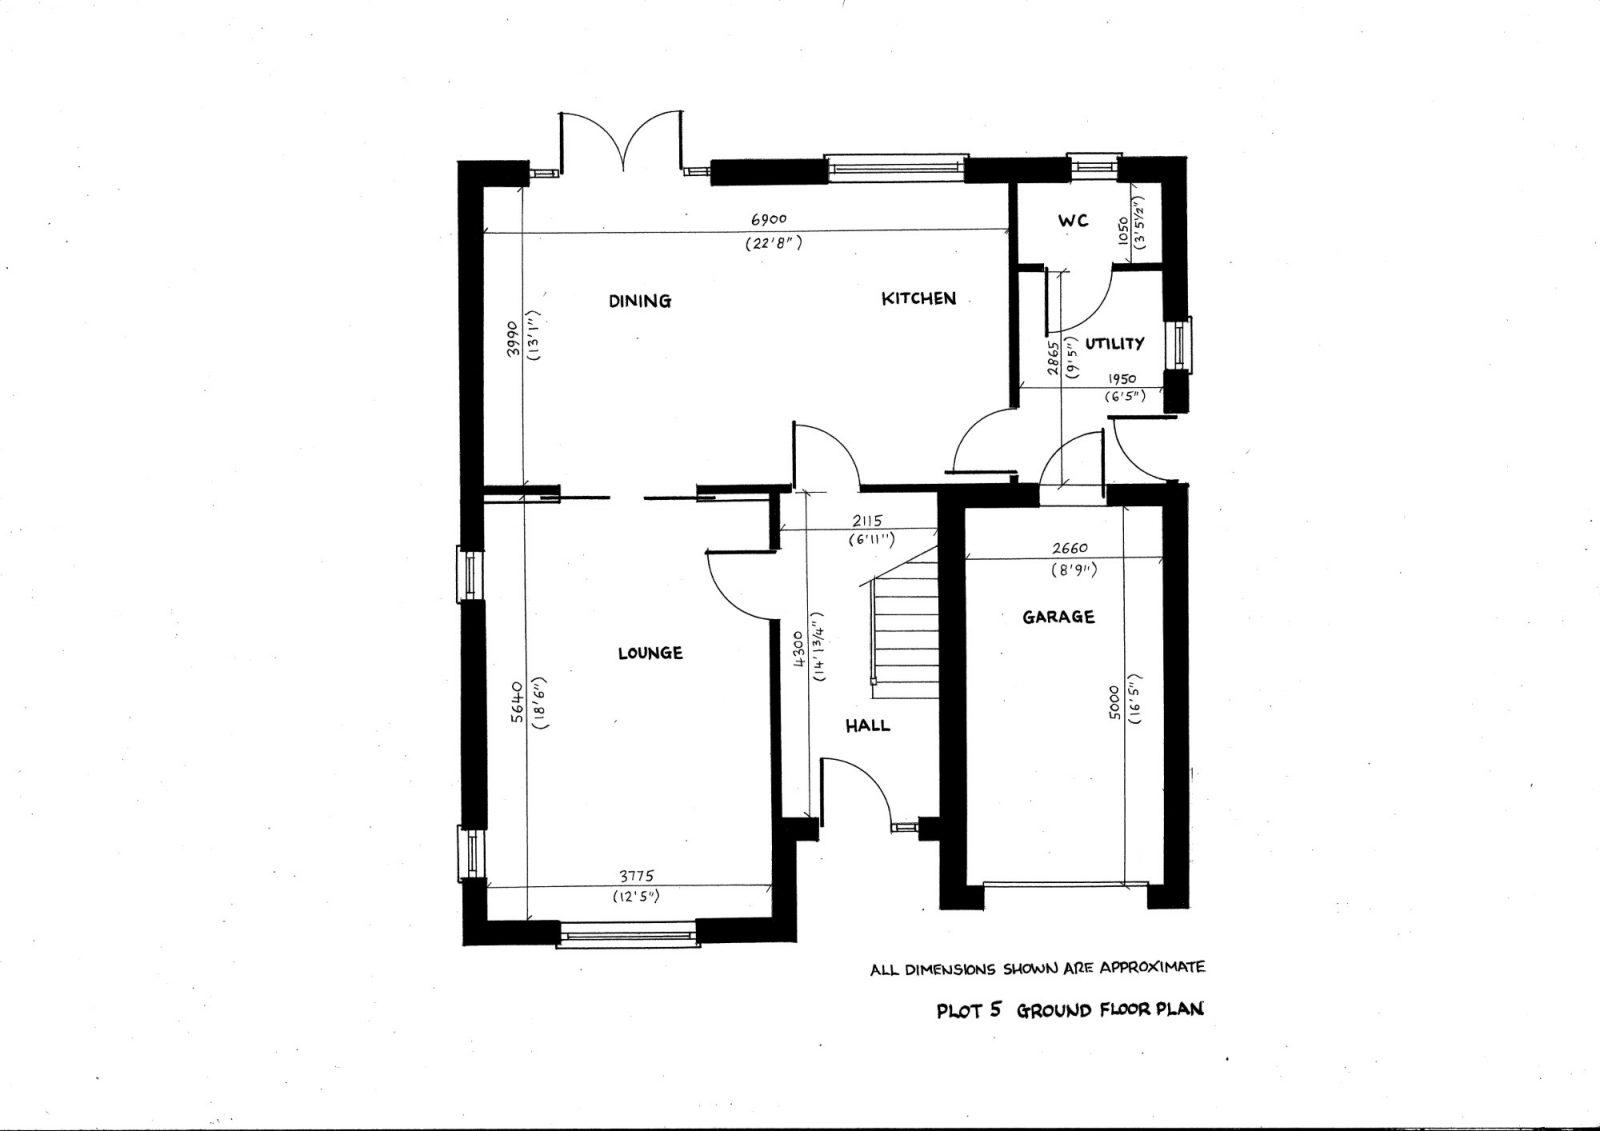 plot 5 ground floor plan